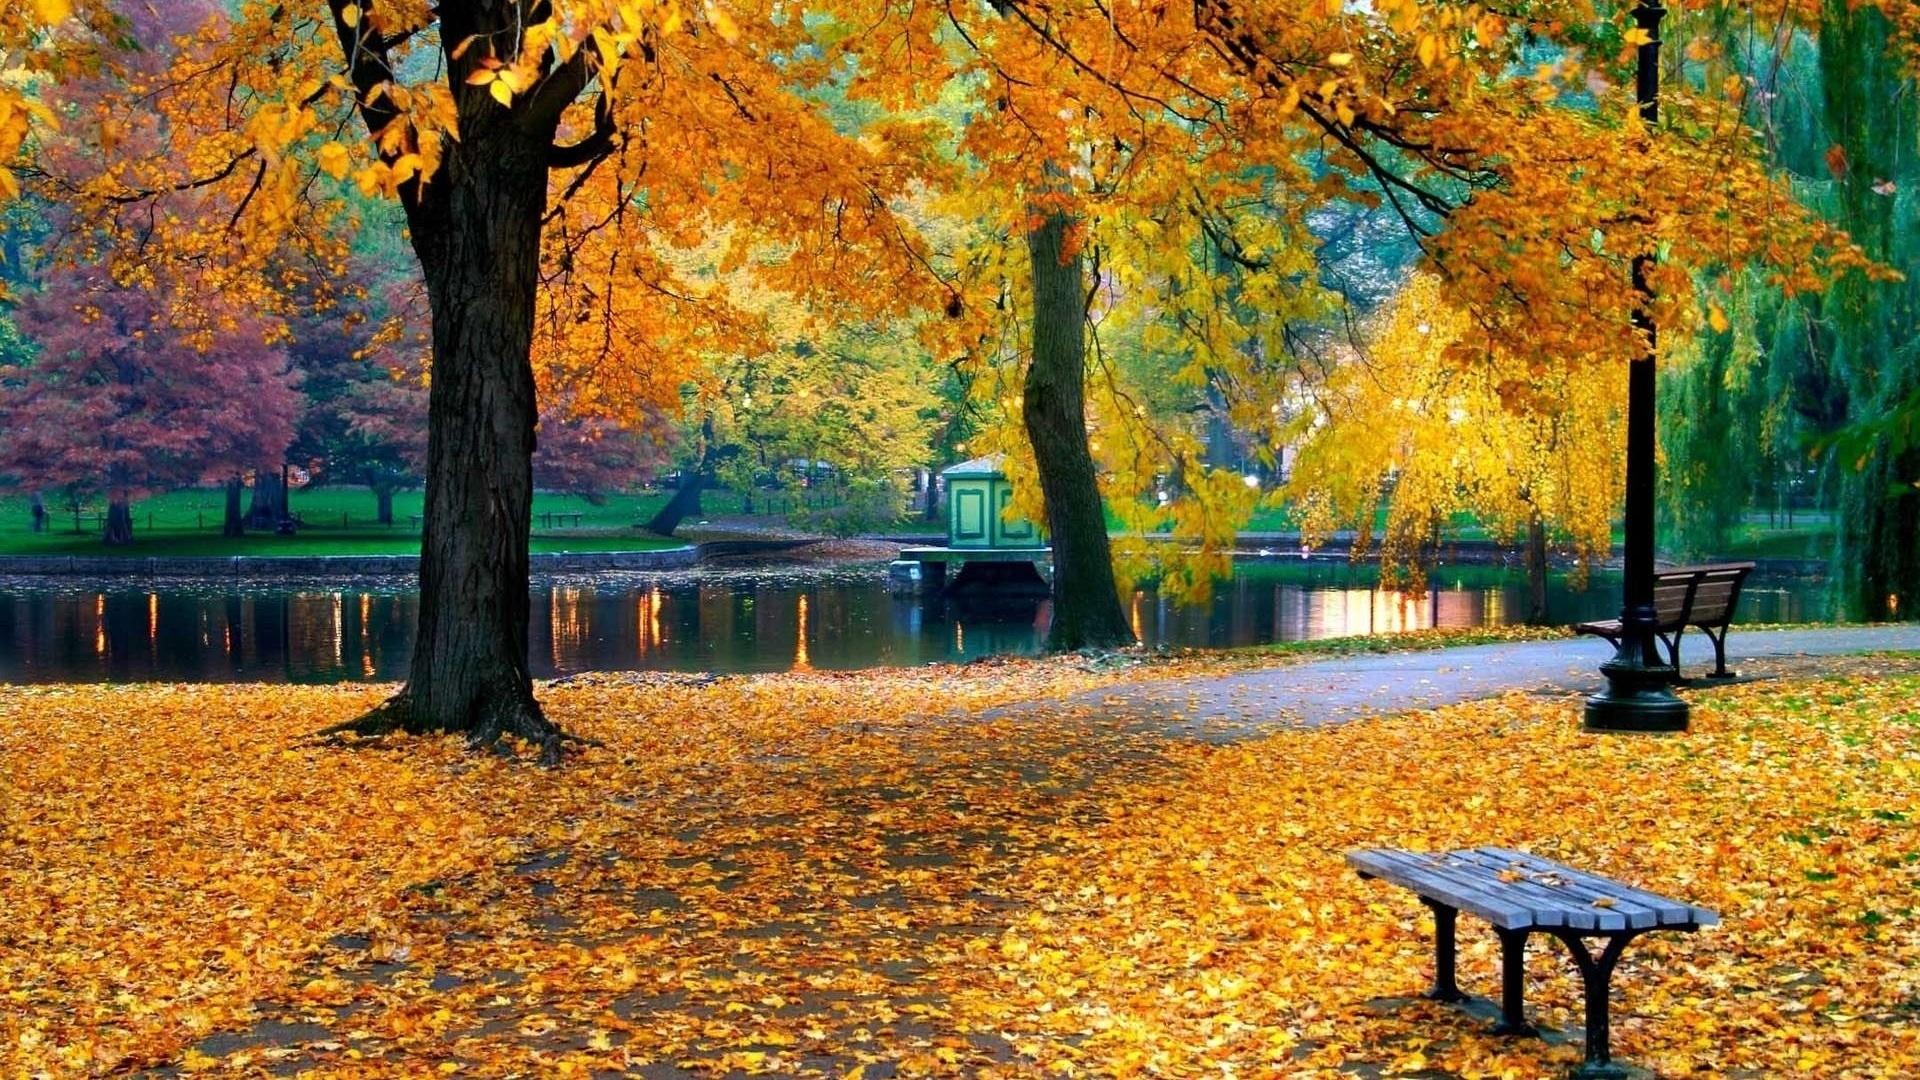 Autumn at its finest #autumn #park #Melbourne #victoria #australia ...